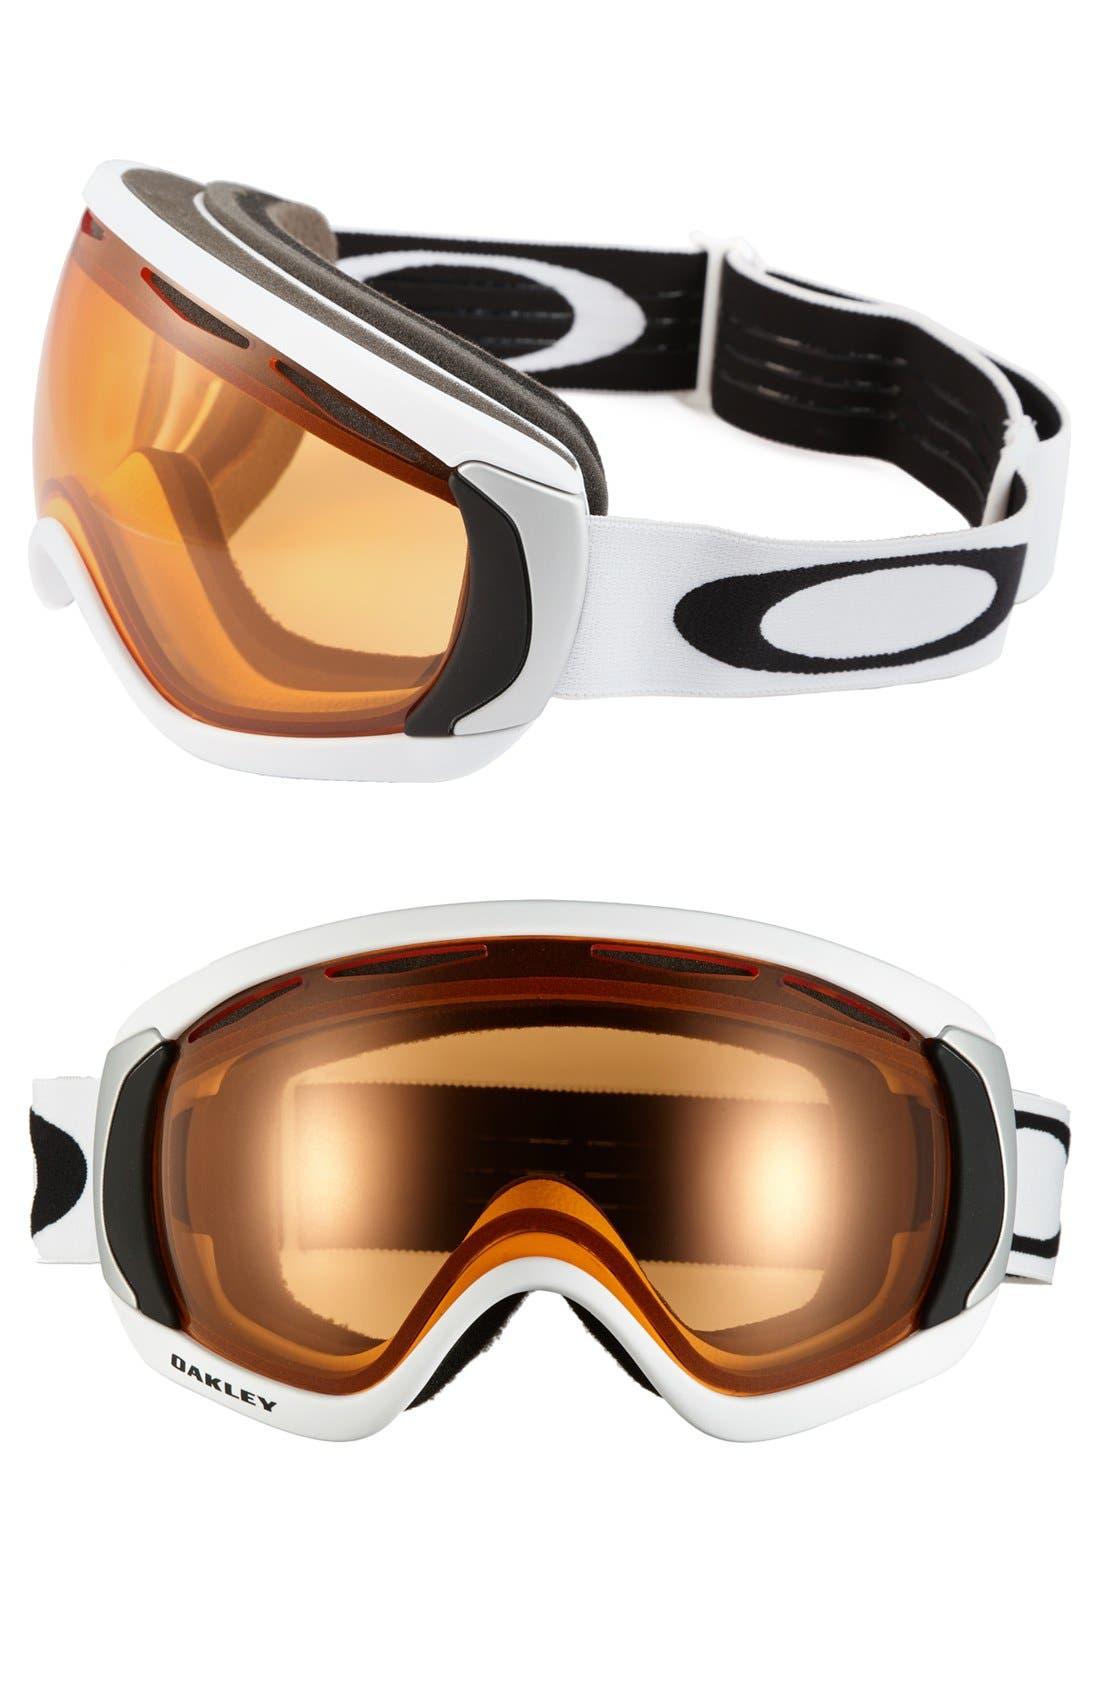 Main Image - Oakley 'Canopy' Snow Goggles